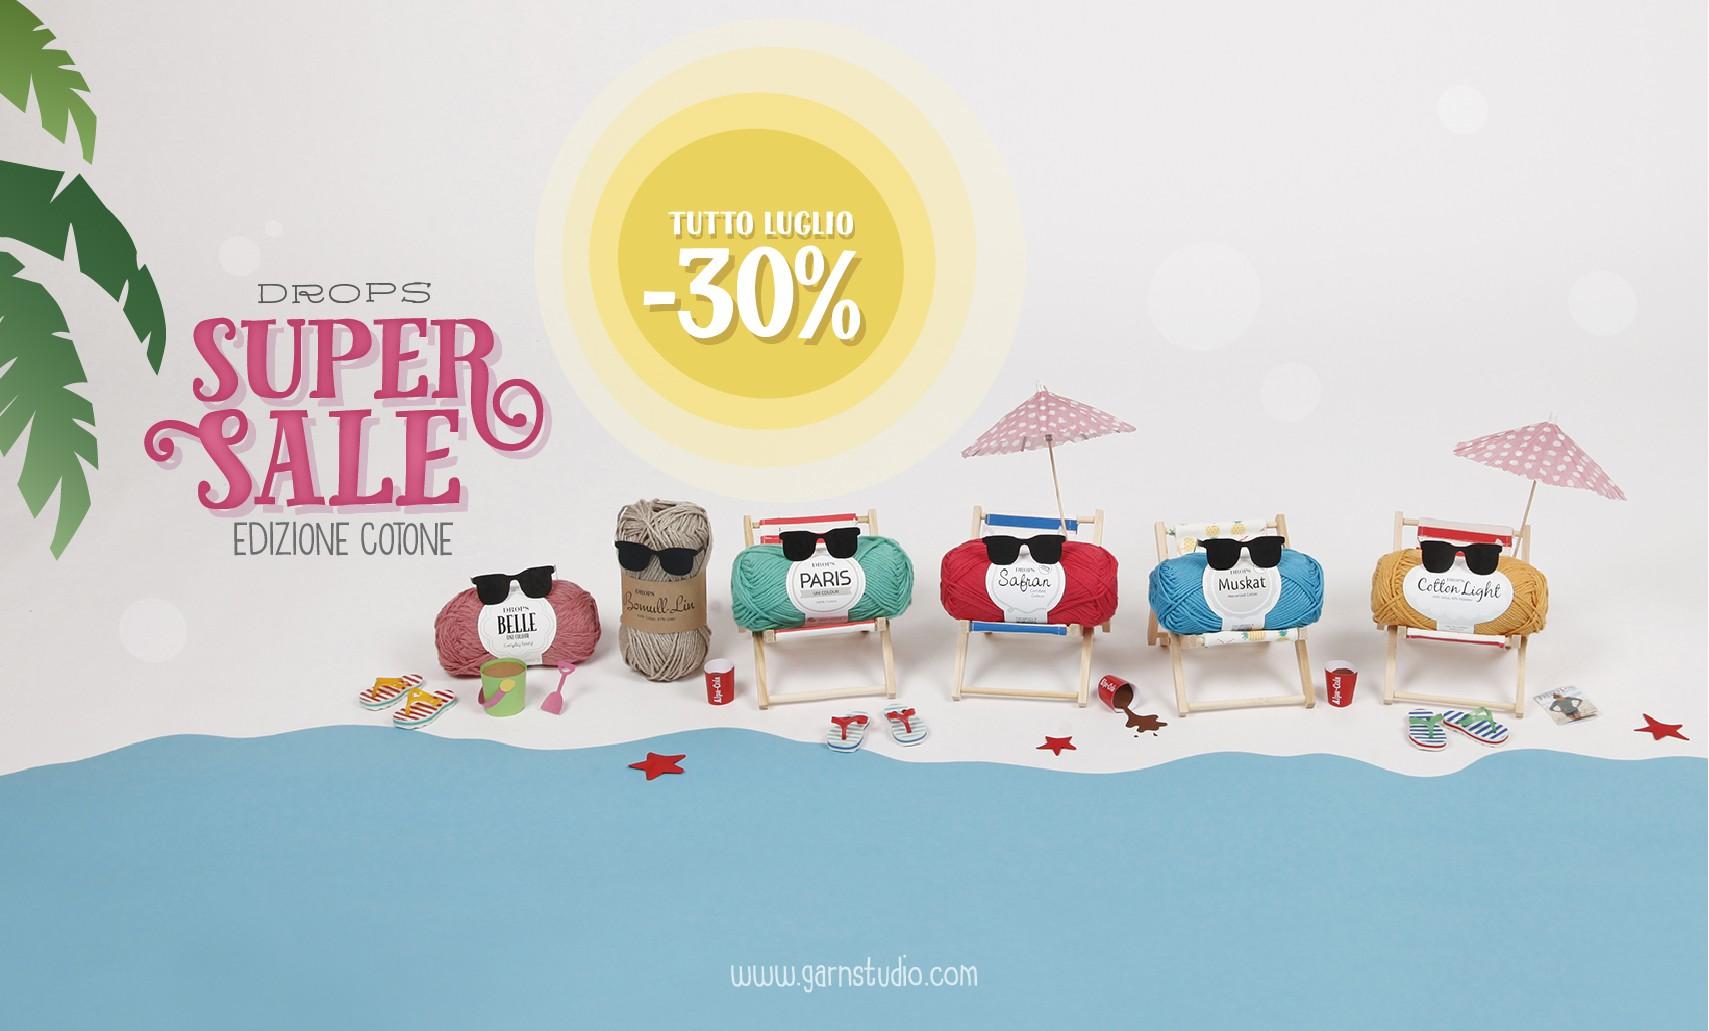 30% di sconto sui filati in lana